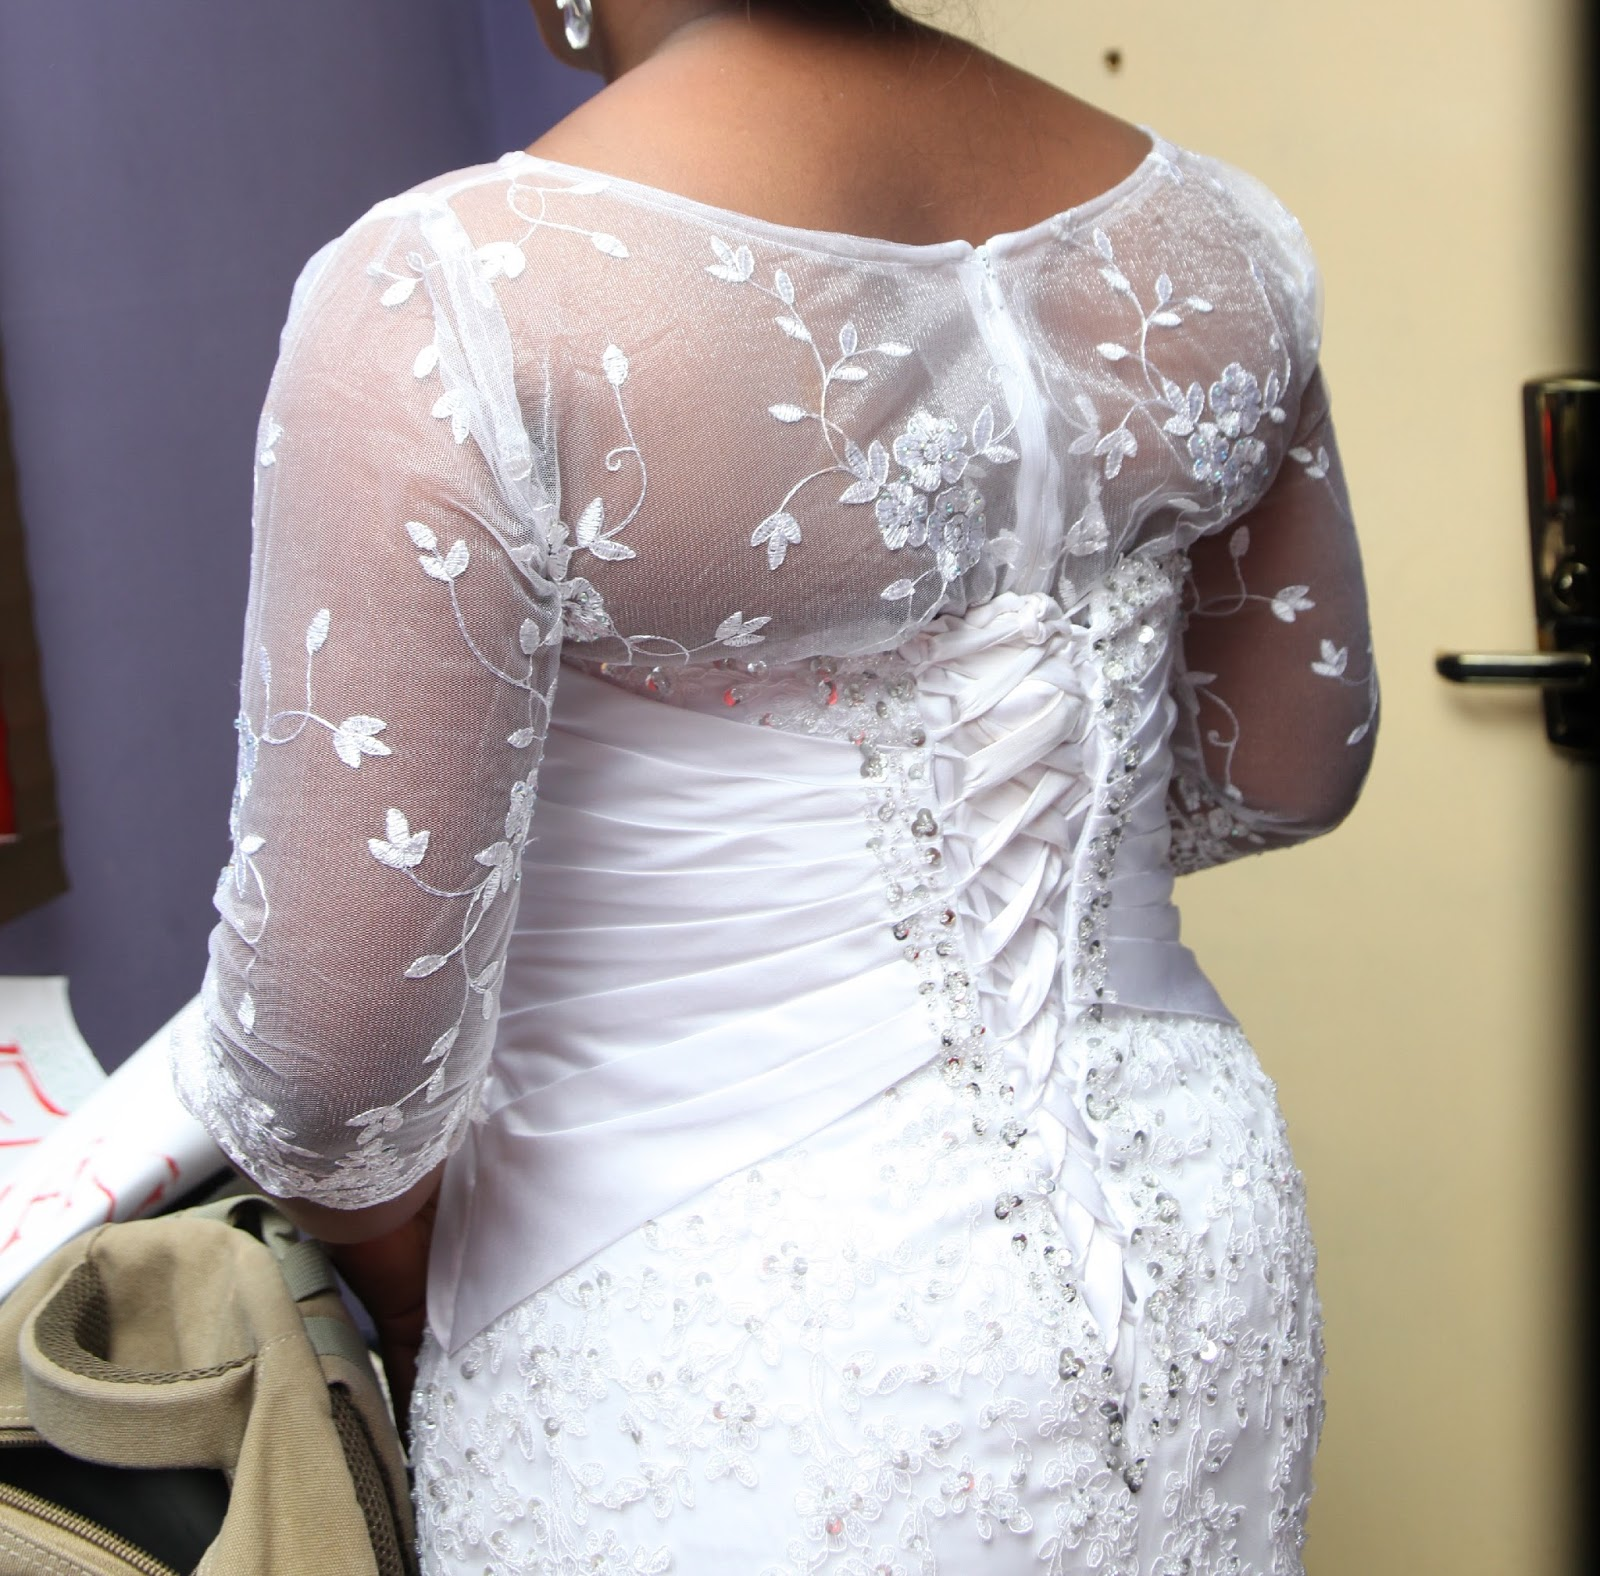 Wedding Dress Buyers 30 Popular The dress is going